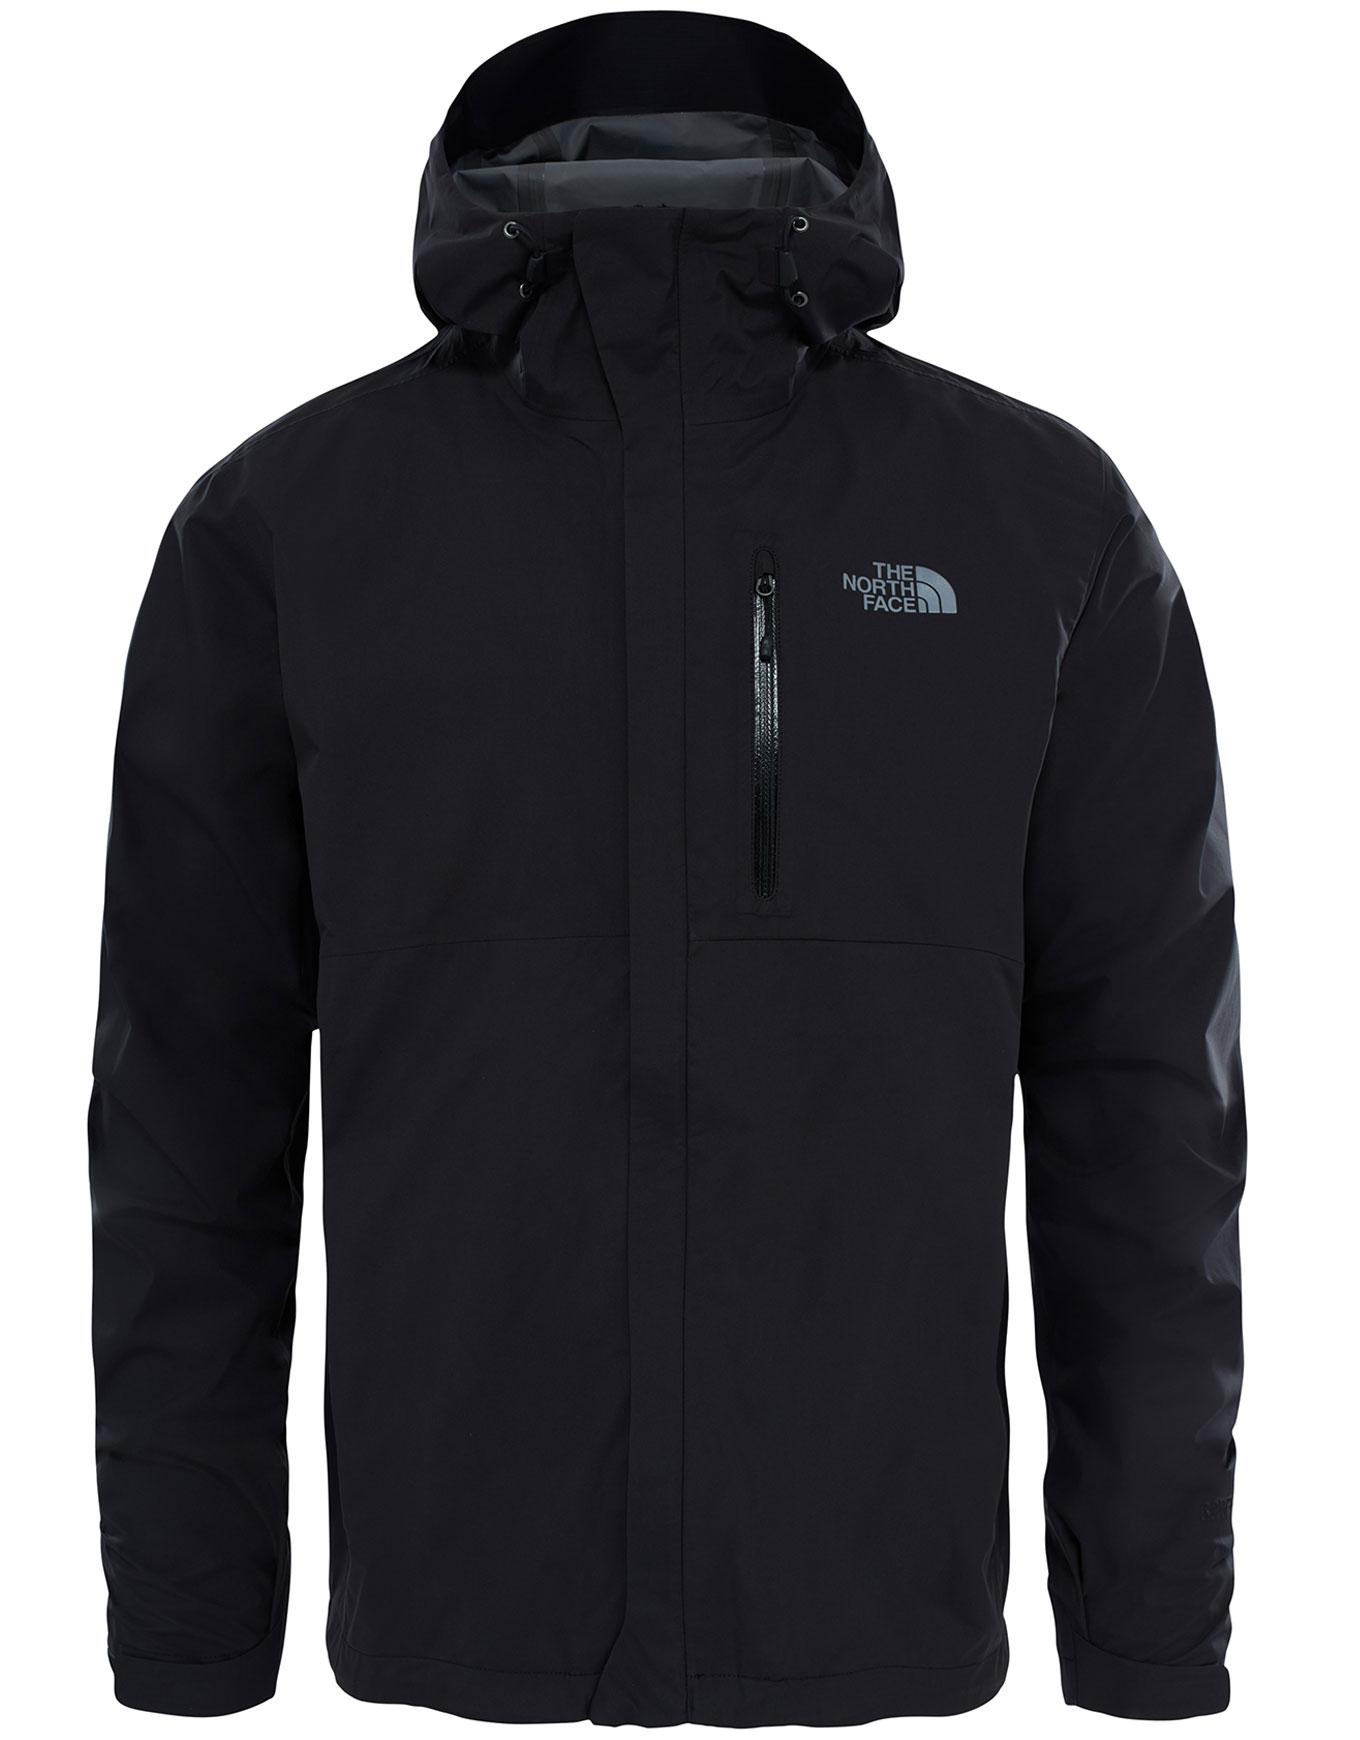 M Dryzzle Jacket Tnf Black The North Face